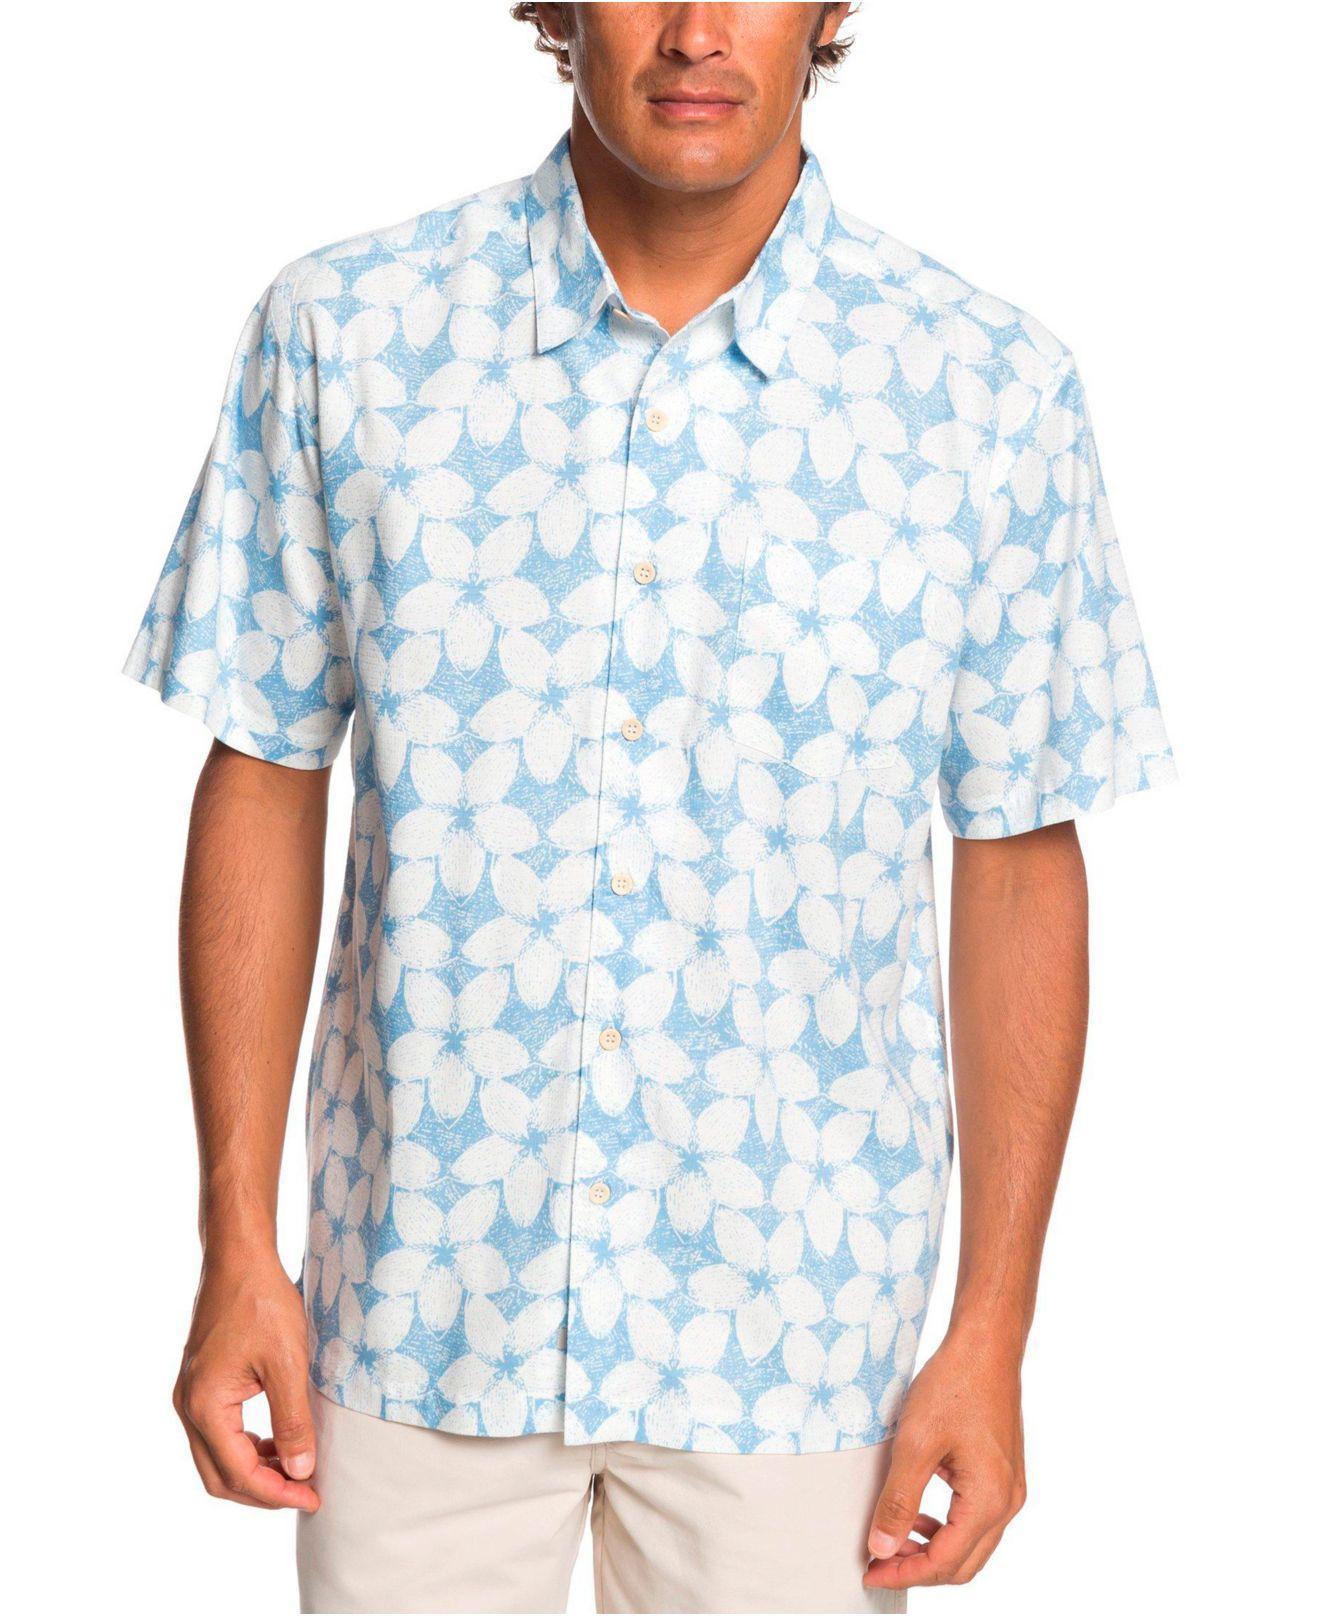 ec43fd6fb Lyst - Quiksilver Ohana Friday Shirt in Blue for Men